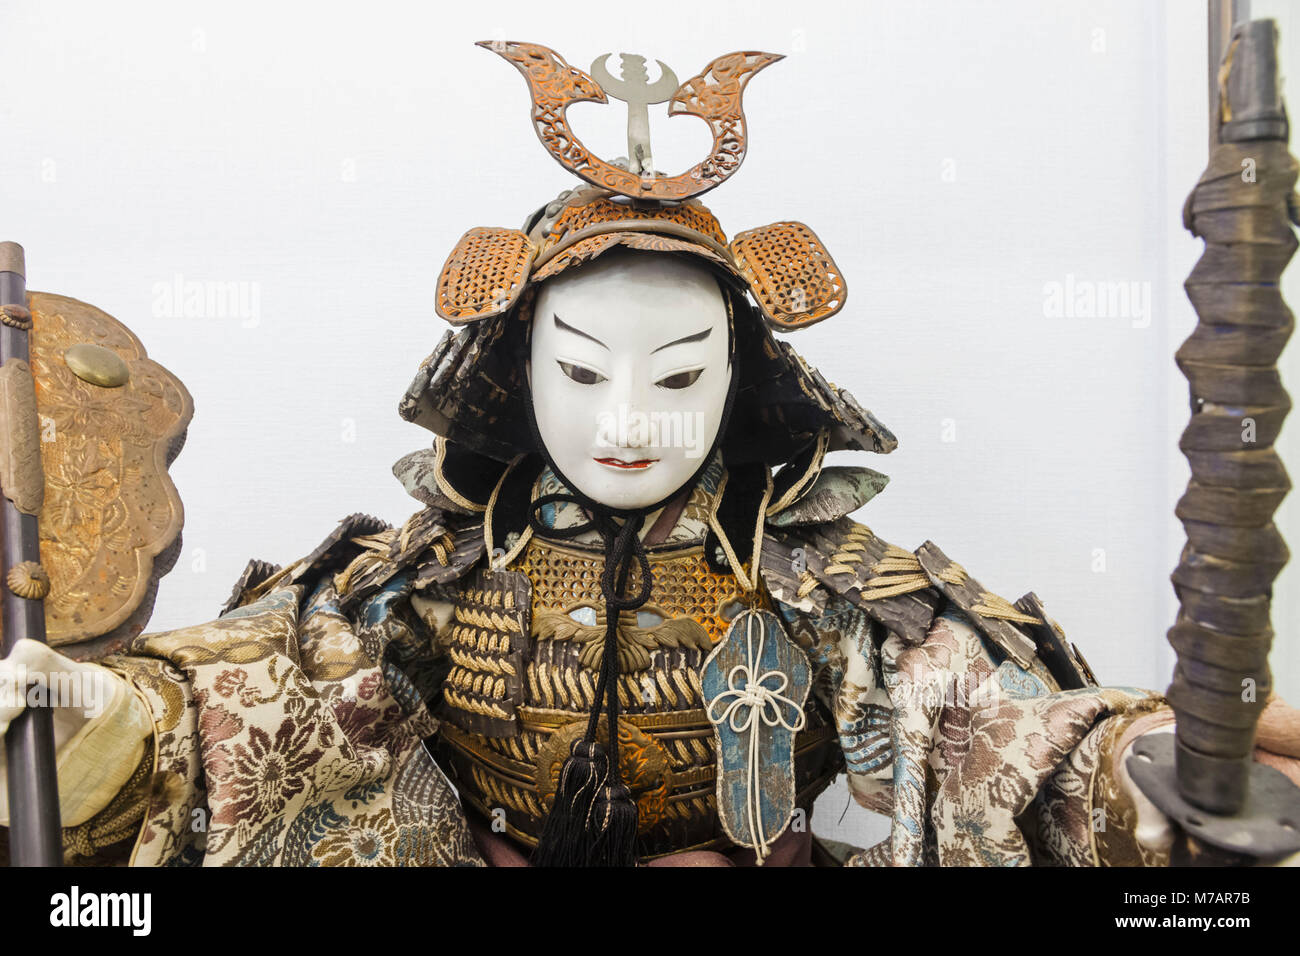 Japan, Honshu, Shizuoka Prefecture, Atami, Atami Castle, Exhibit of Japanese Doll Dressed in Warrior Costume - Stock Image